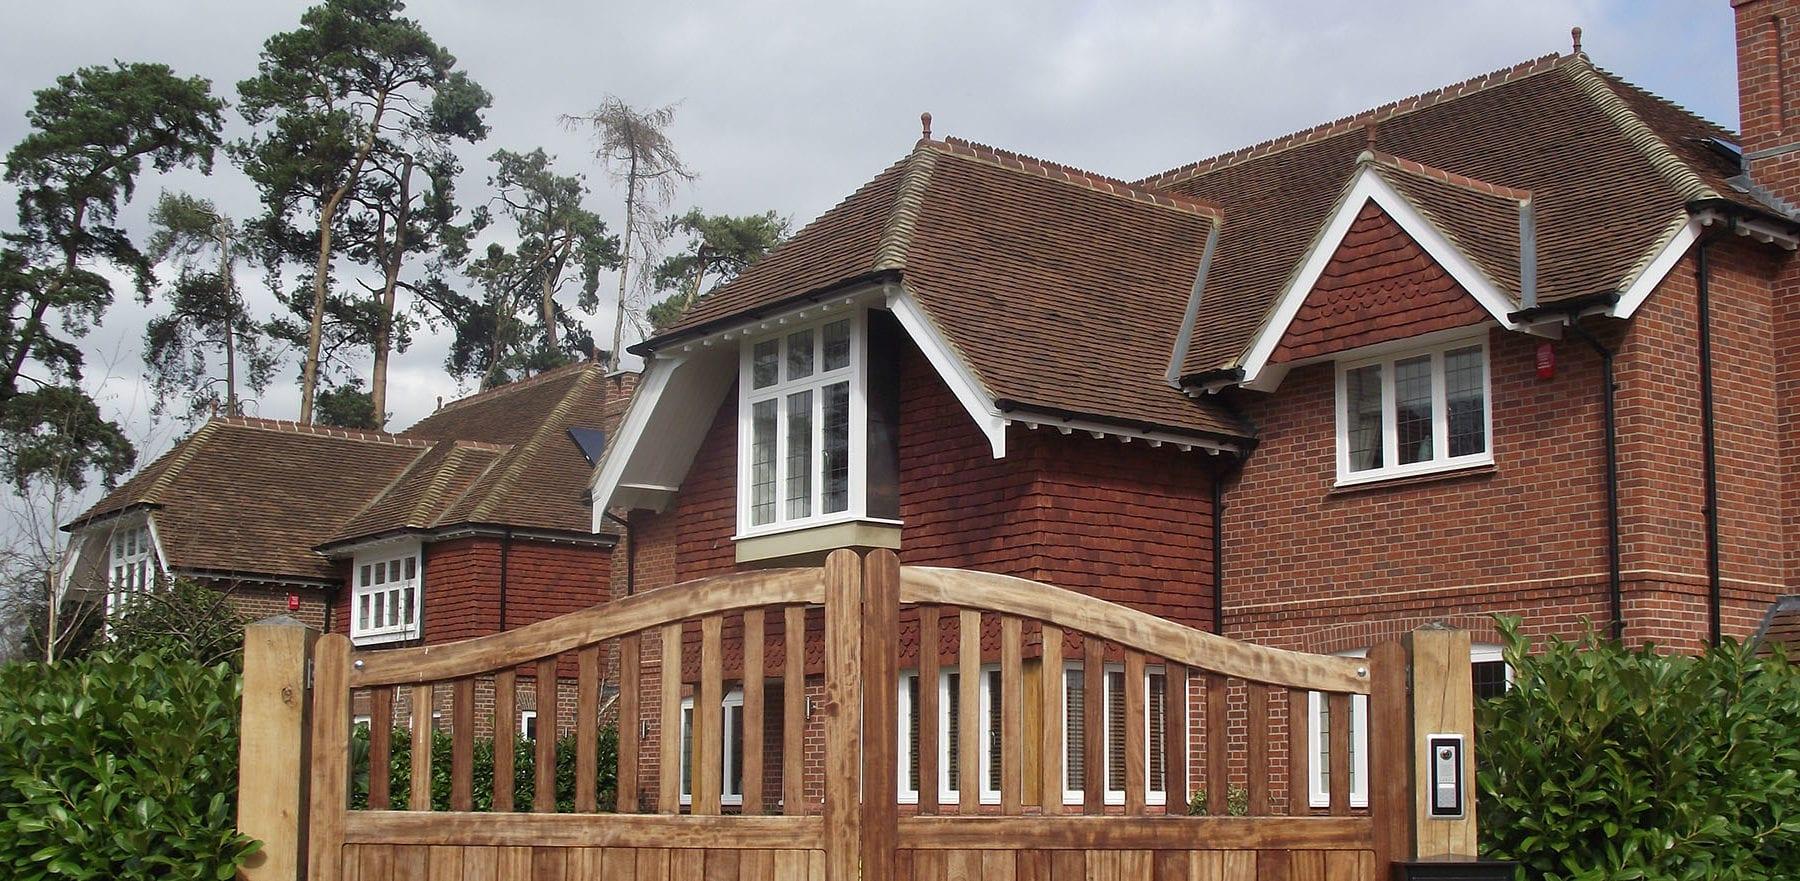 Lifestiles - Handmade Restoration Clay Roof Tiles - Cranleigh, England 2